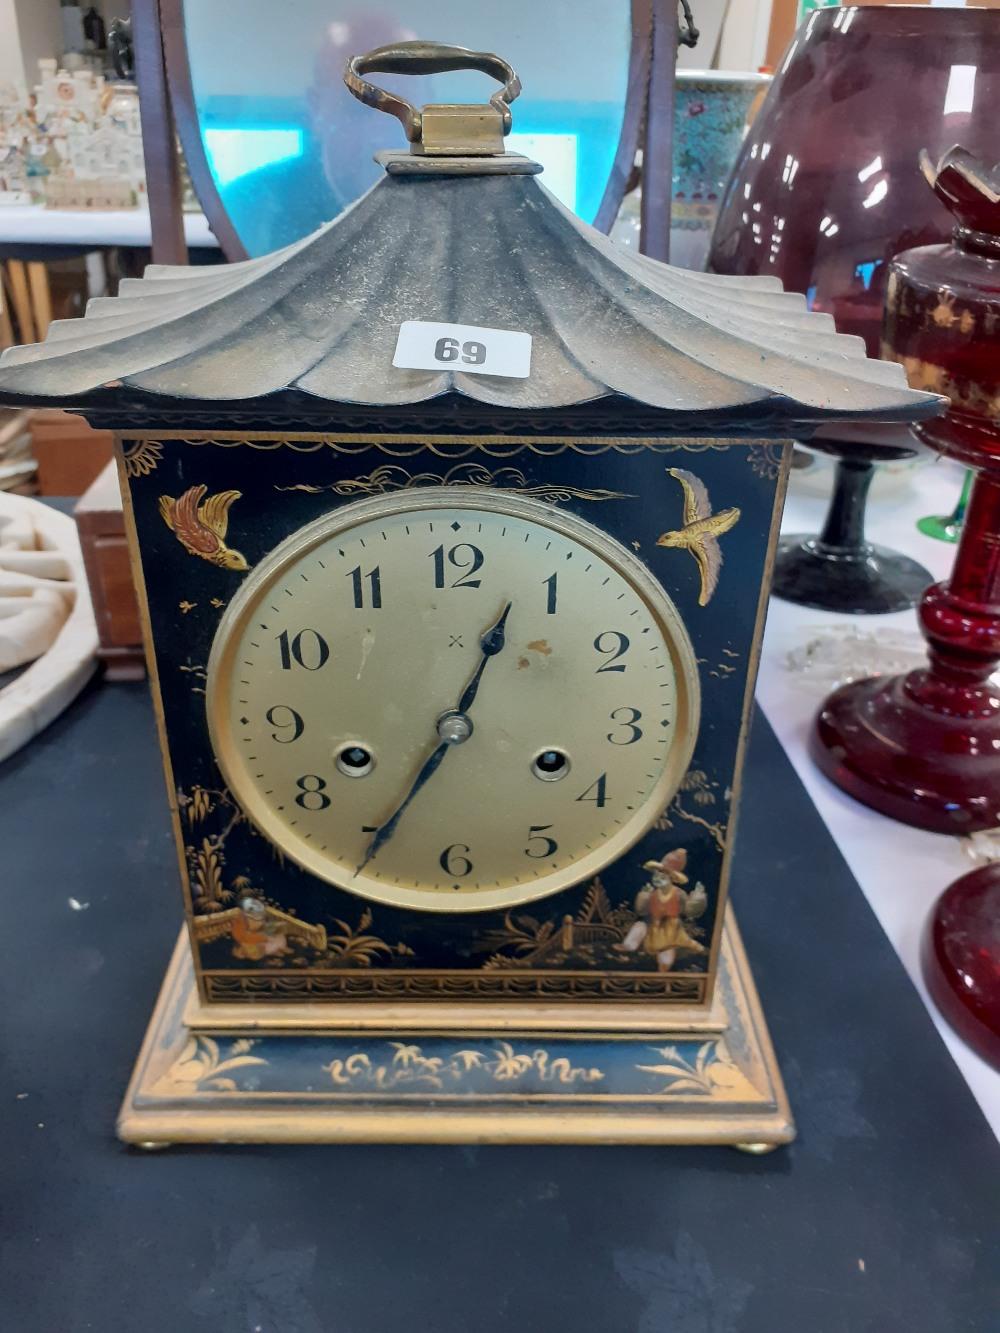 1920 CHINOISORIE DECORATED CLOCK